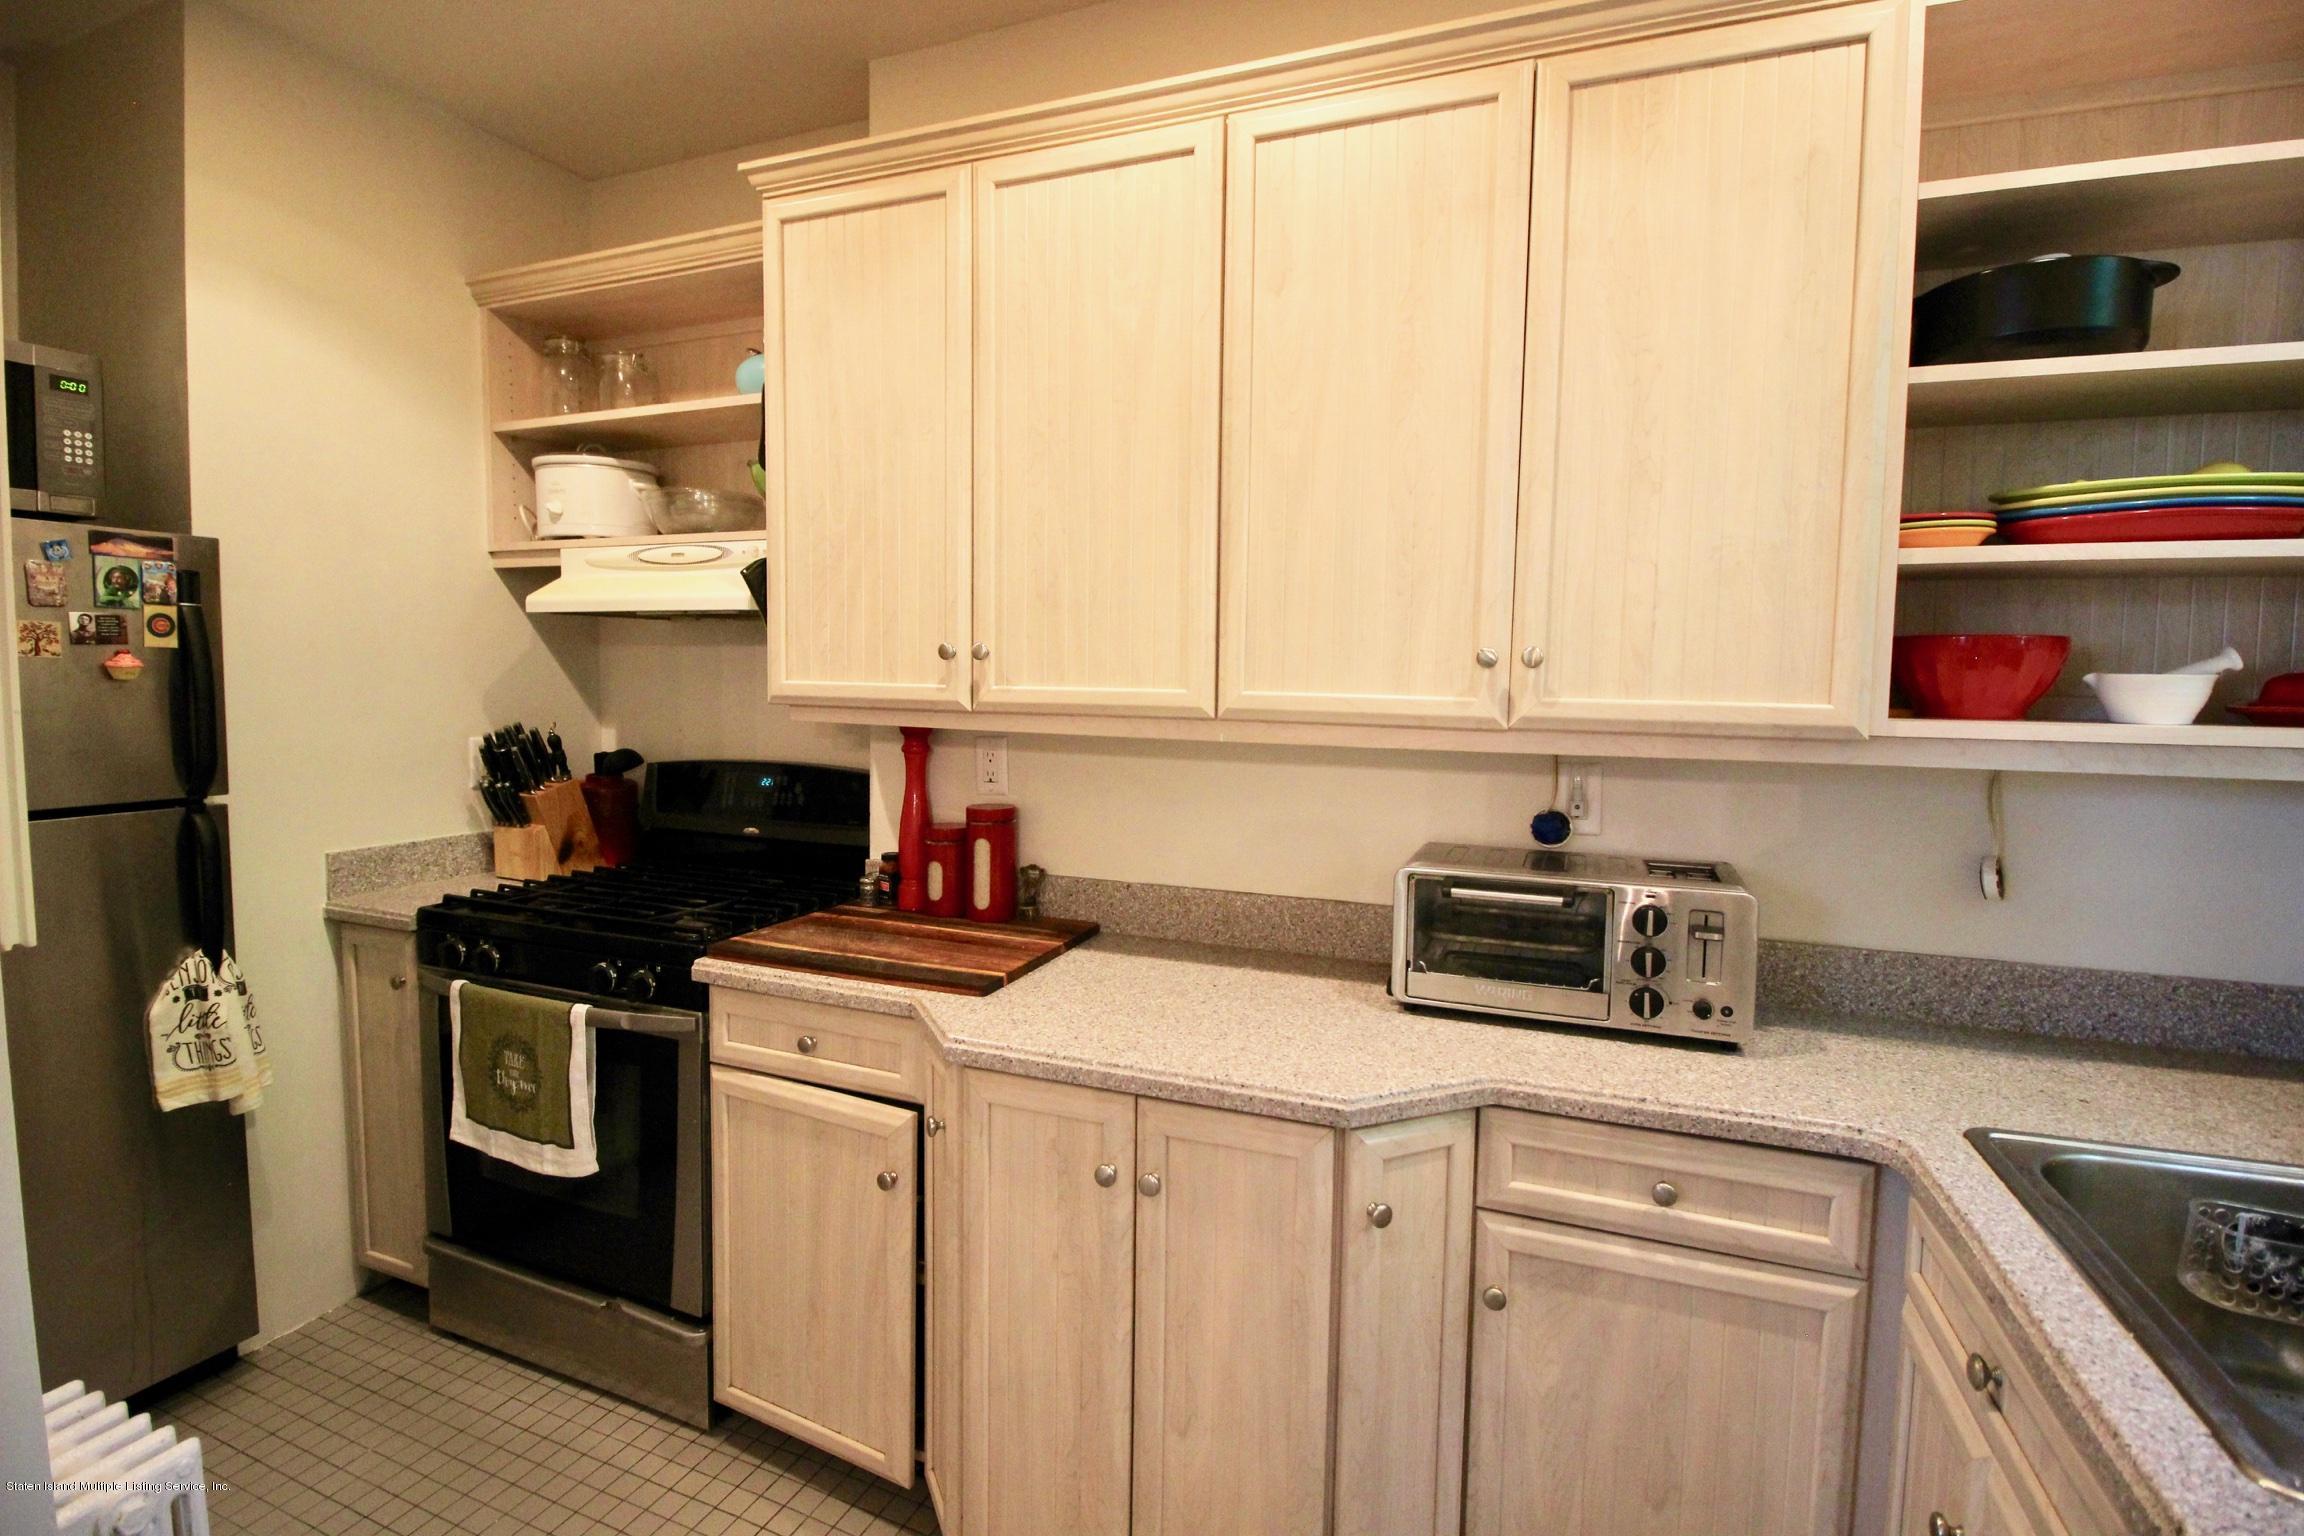 Single Family - Detached 208 St Pauls Avenue  Staten Island, NY 10304, MLS-1129566-19